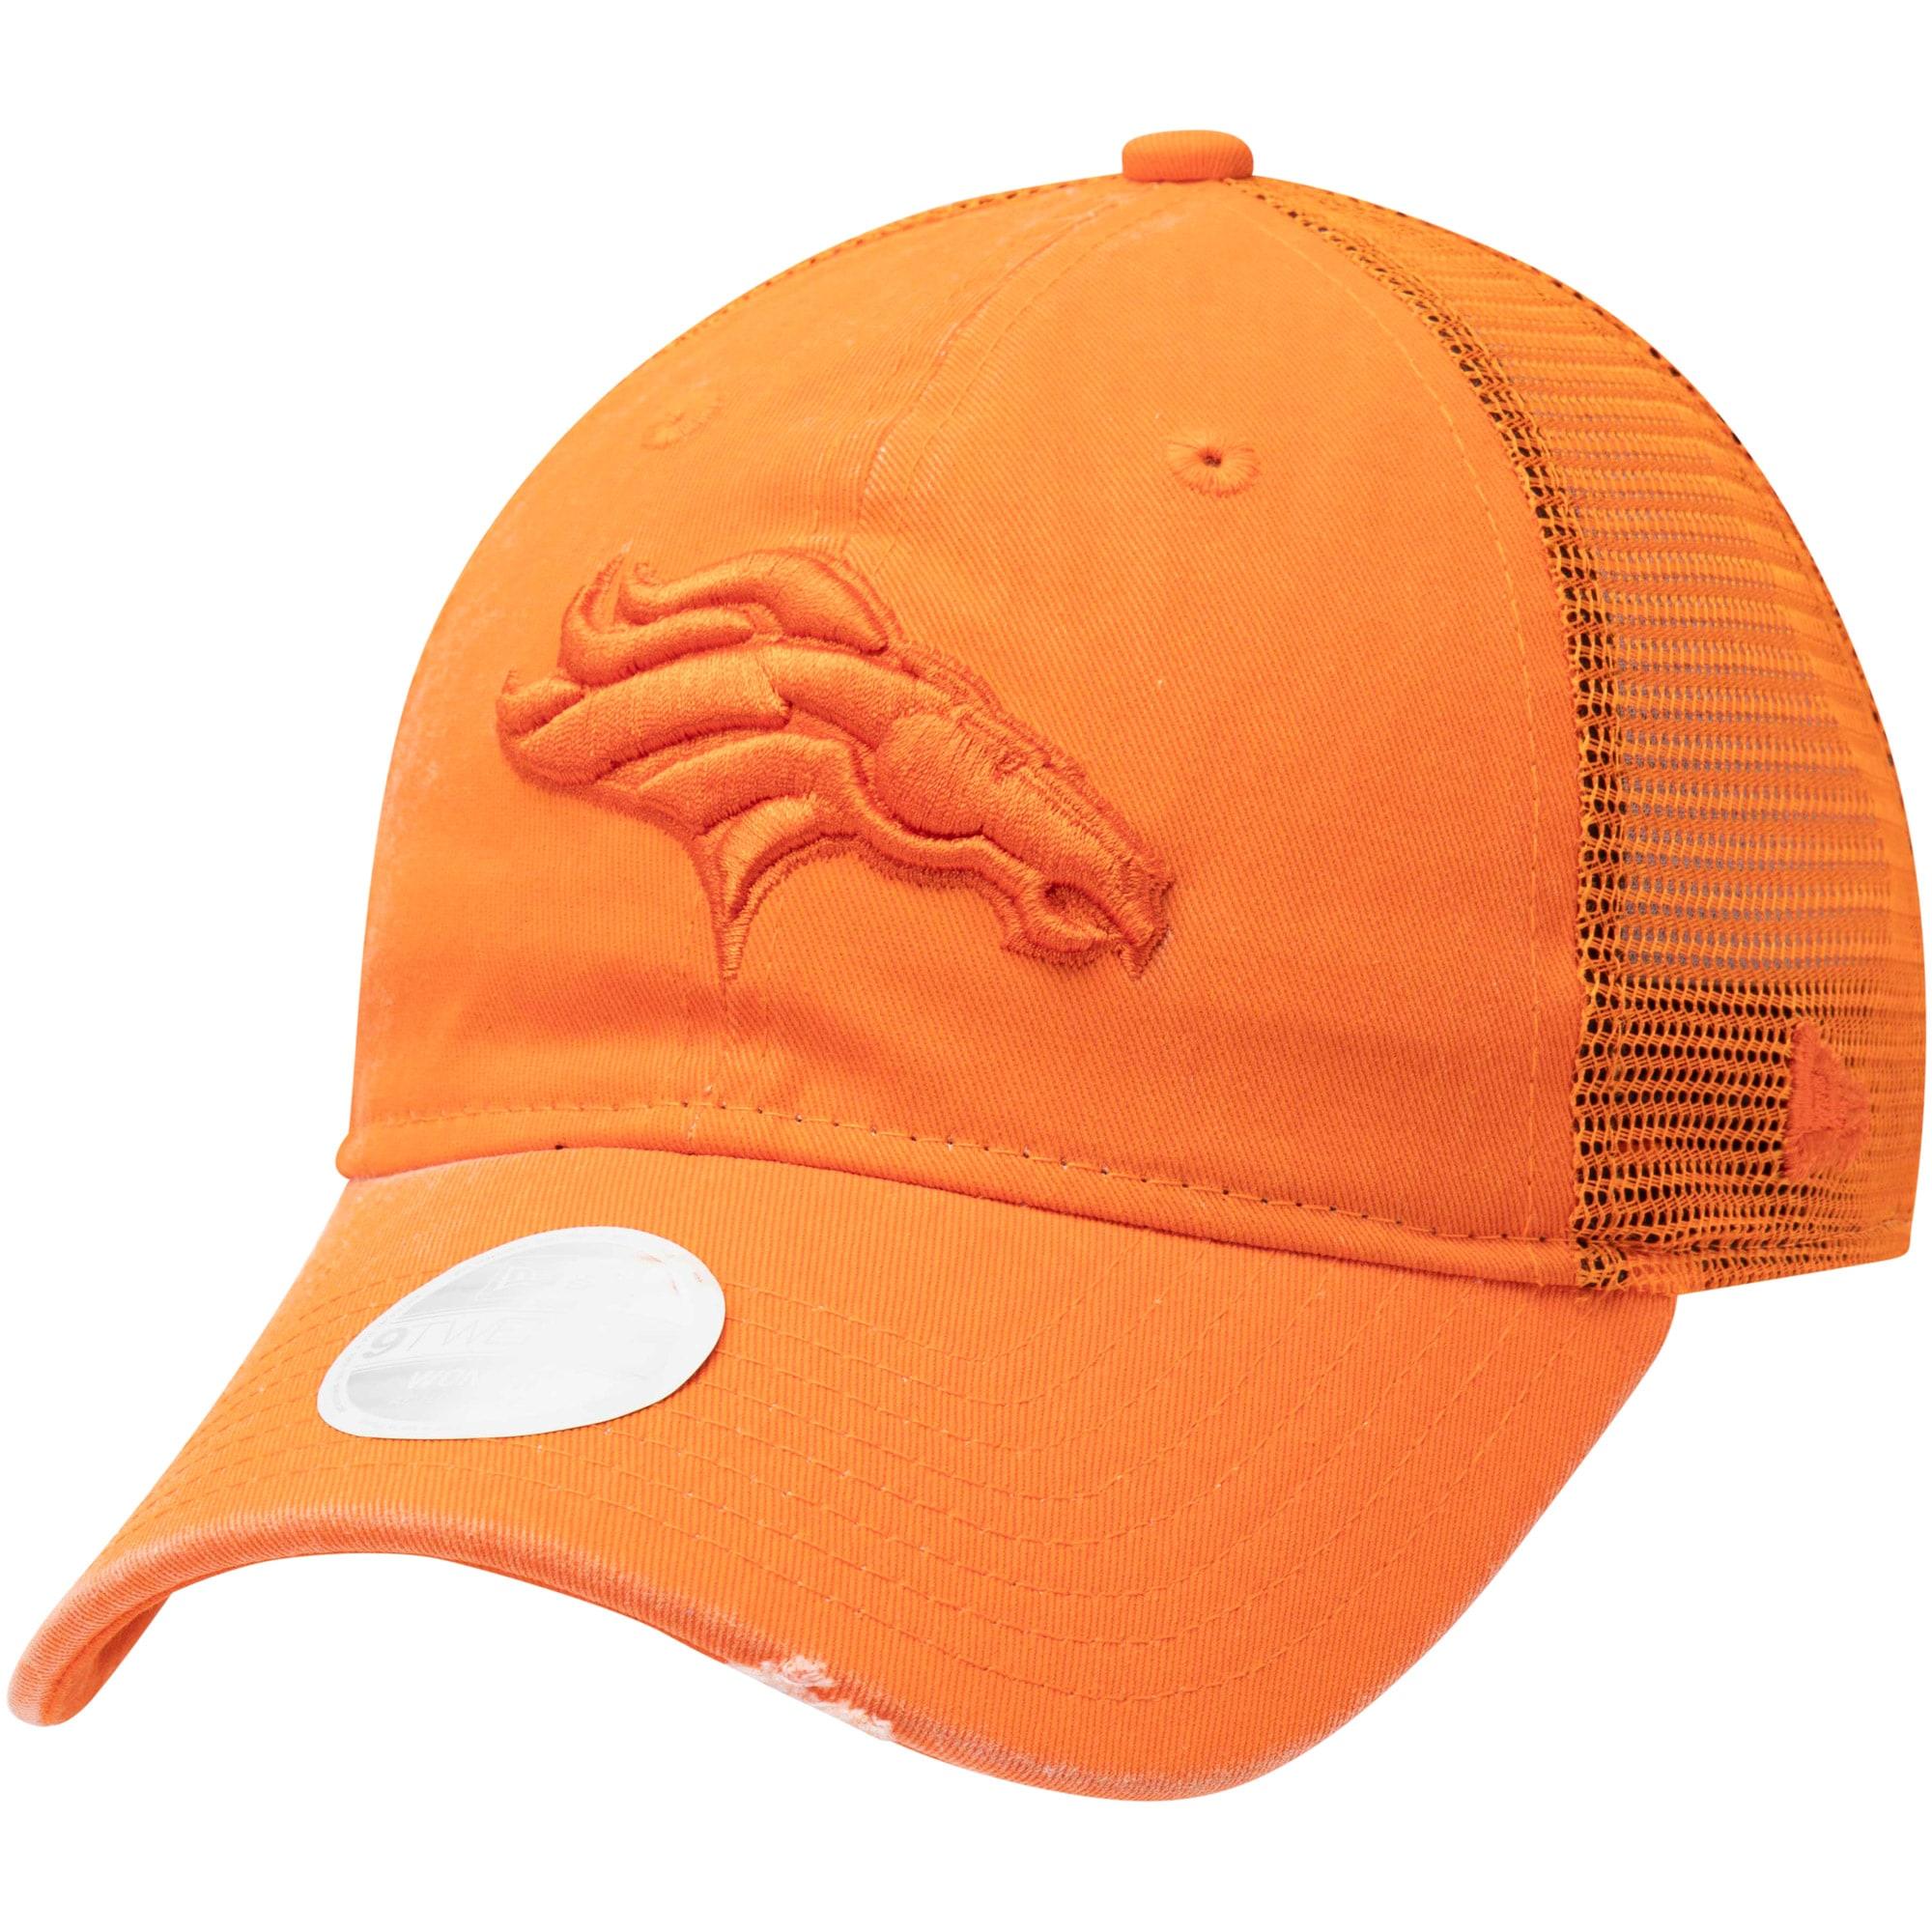 Denver Broncos New Era Women's Tonal Washed Trucker 9TWENTY Adjustable Hat - Orange